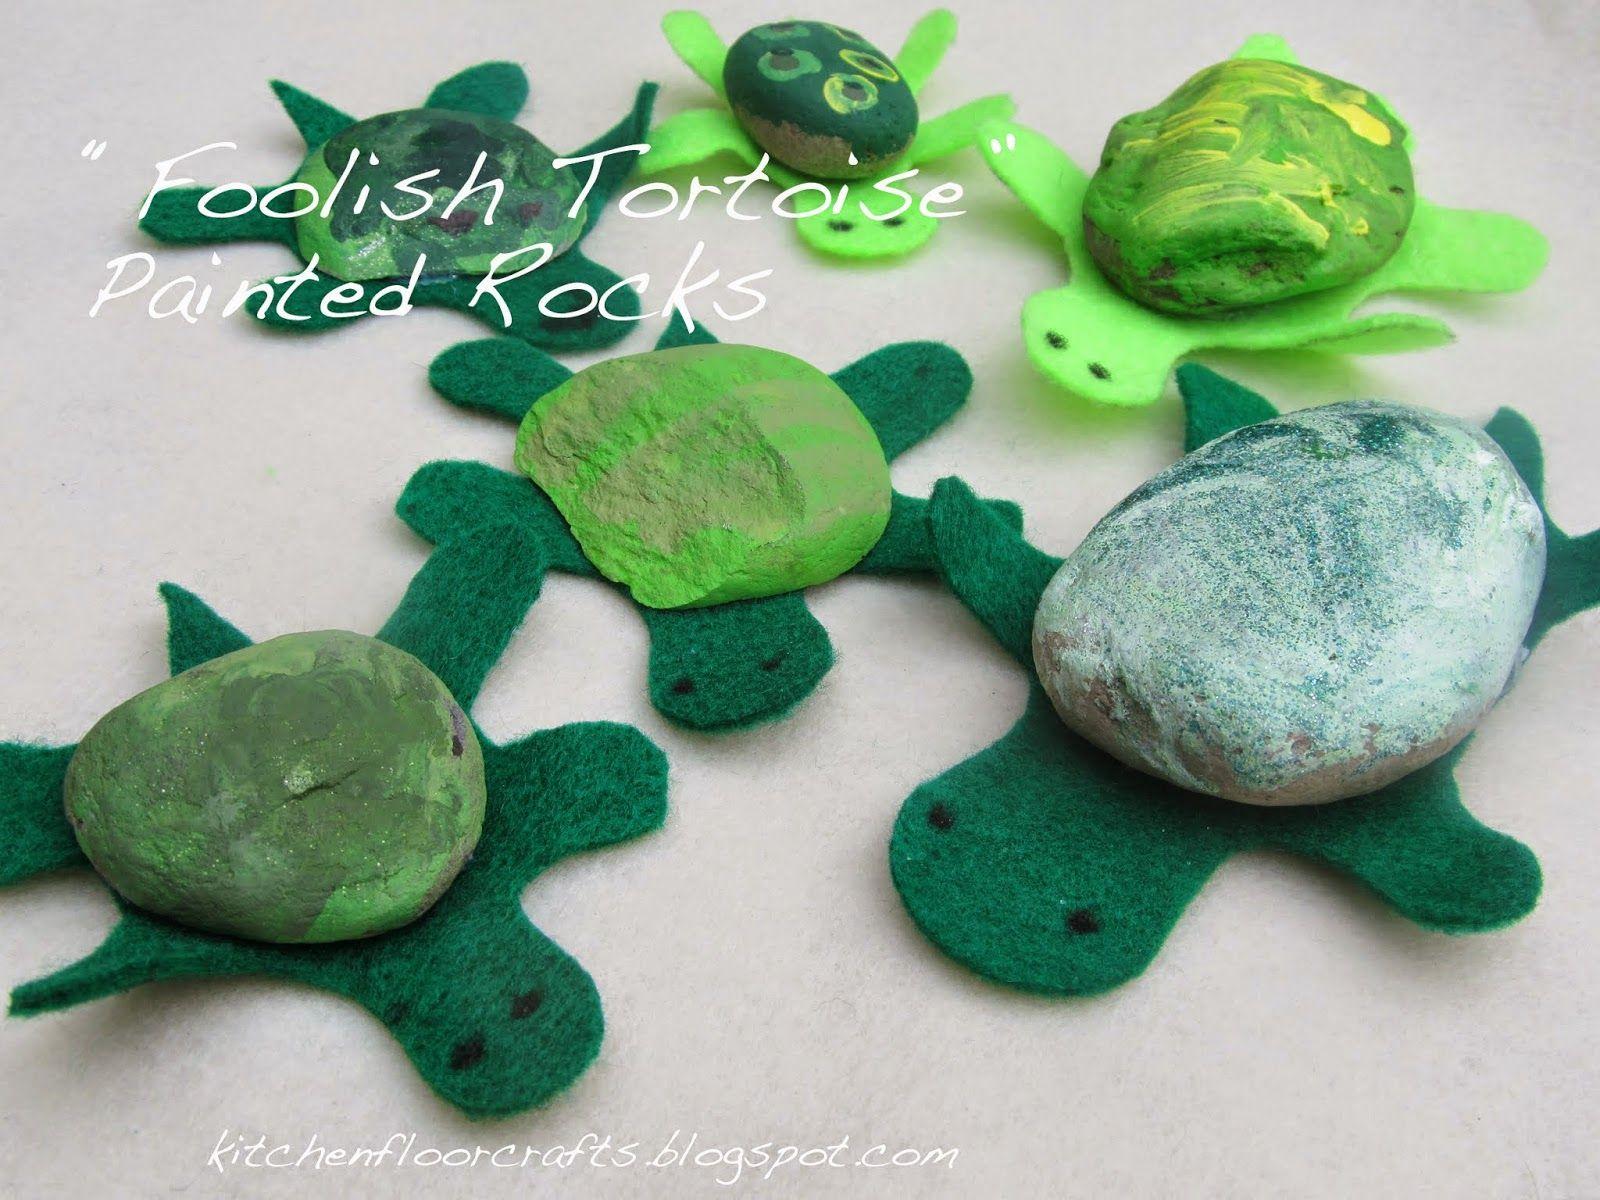 Kitchen Floor Crafts: Foolish Tortoise Painted Rocks ... - photo#9